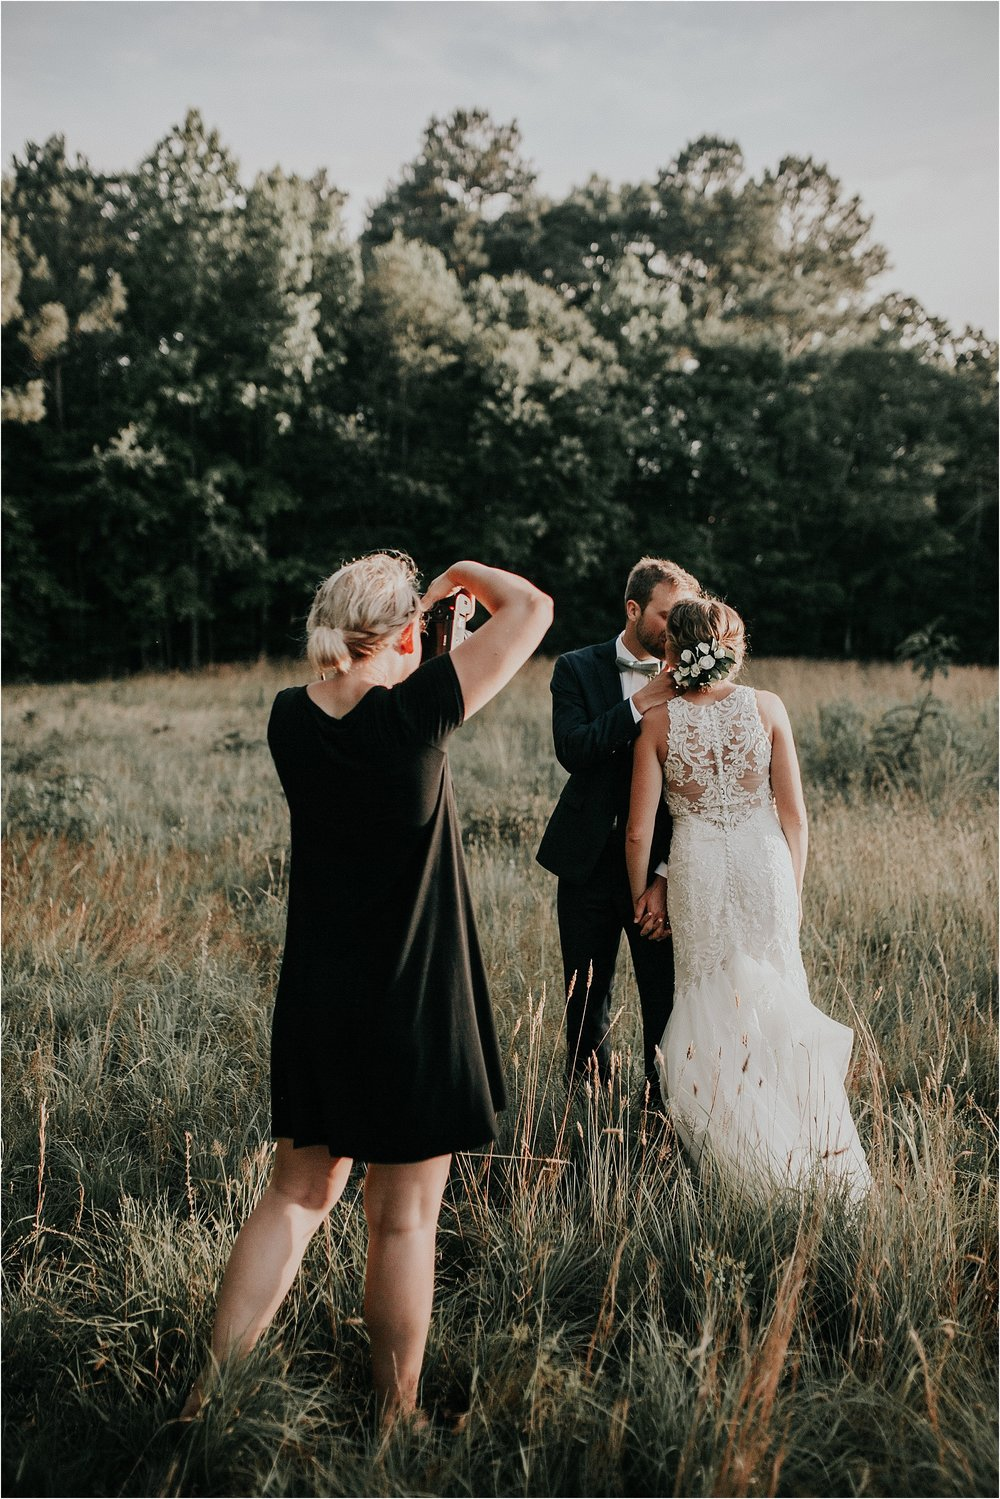 Sarah_Brookhart_PA_MD_Wedding_Photographer_0018.jpg